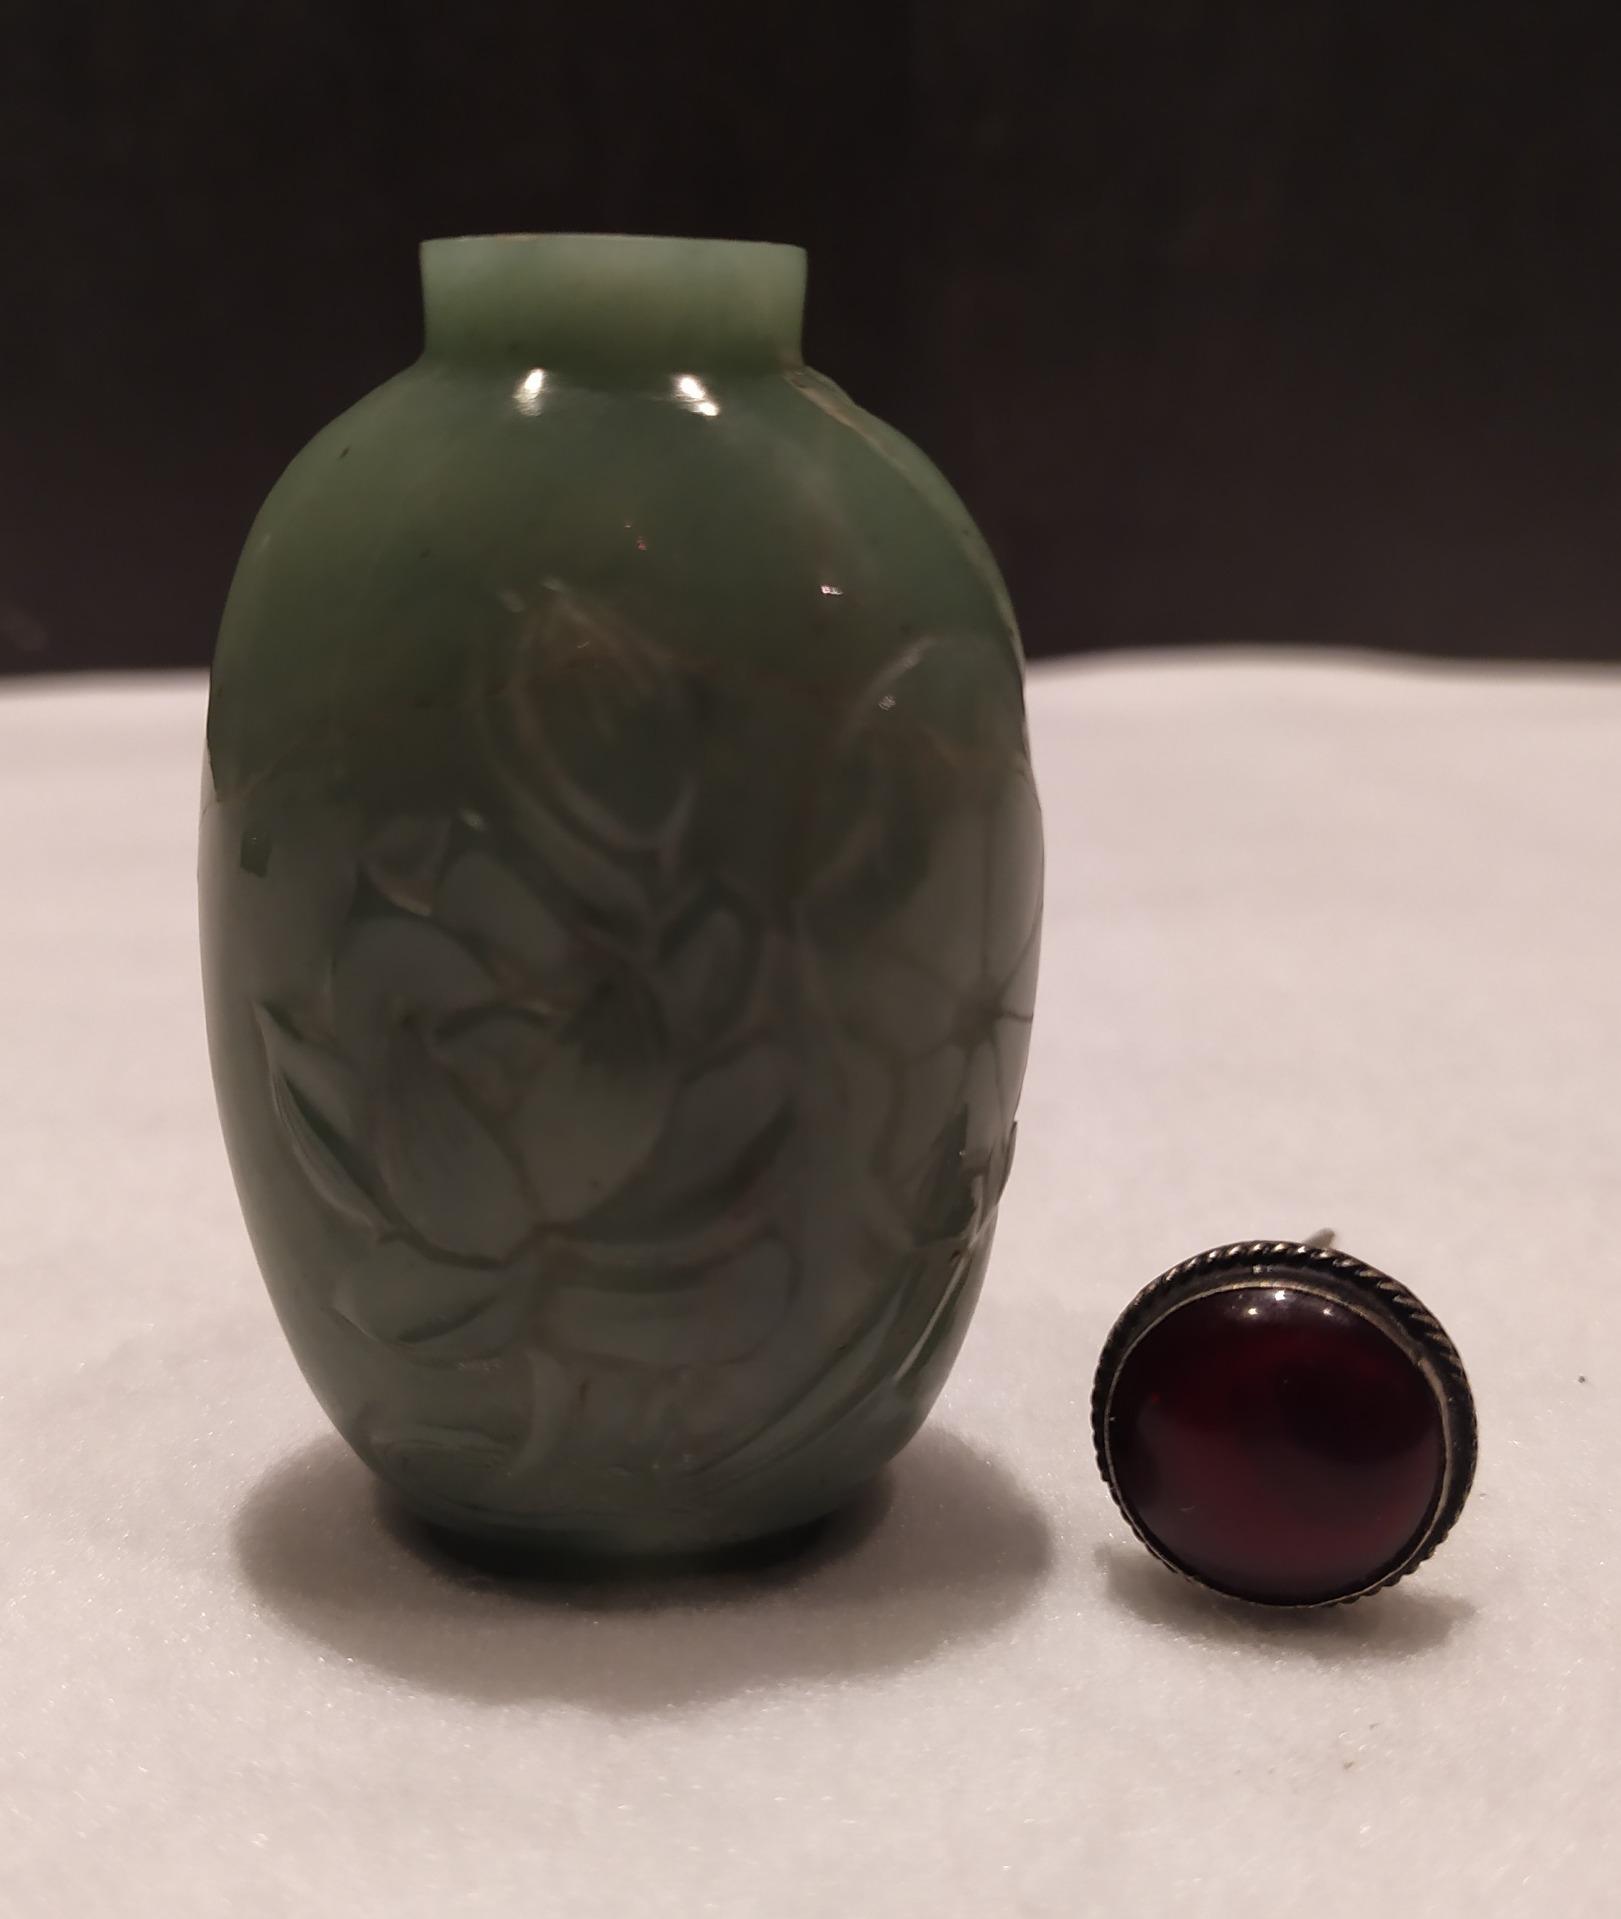 thumb7|Snuff bottle, porta tabacco fiuto, giada verde motivi floreali, Cina XX secolo